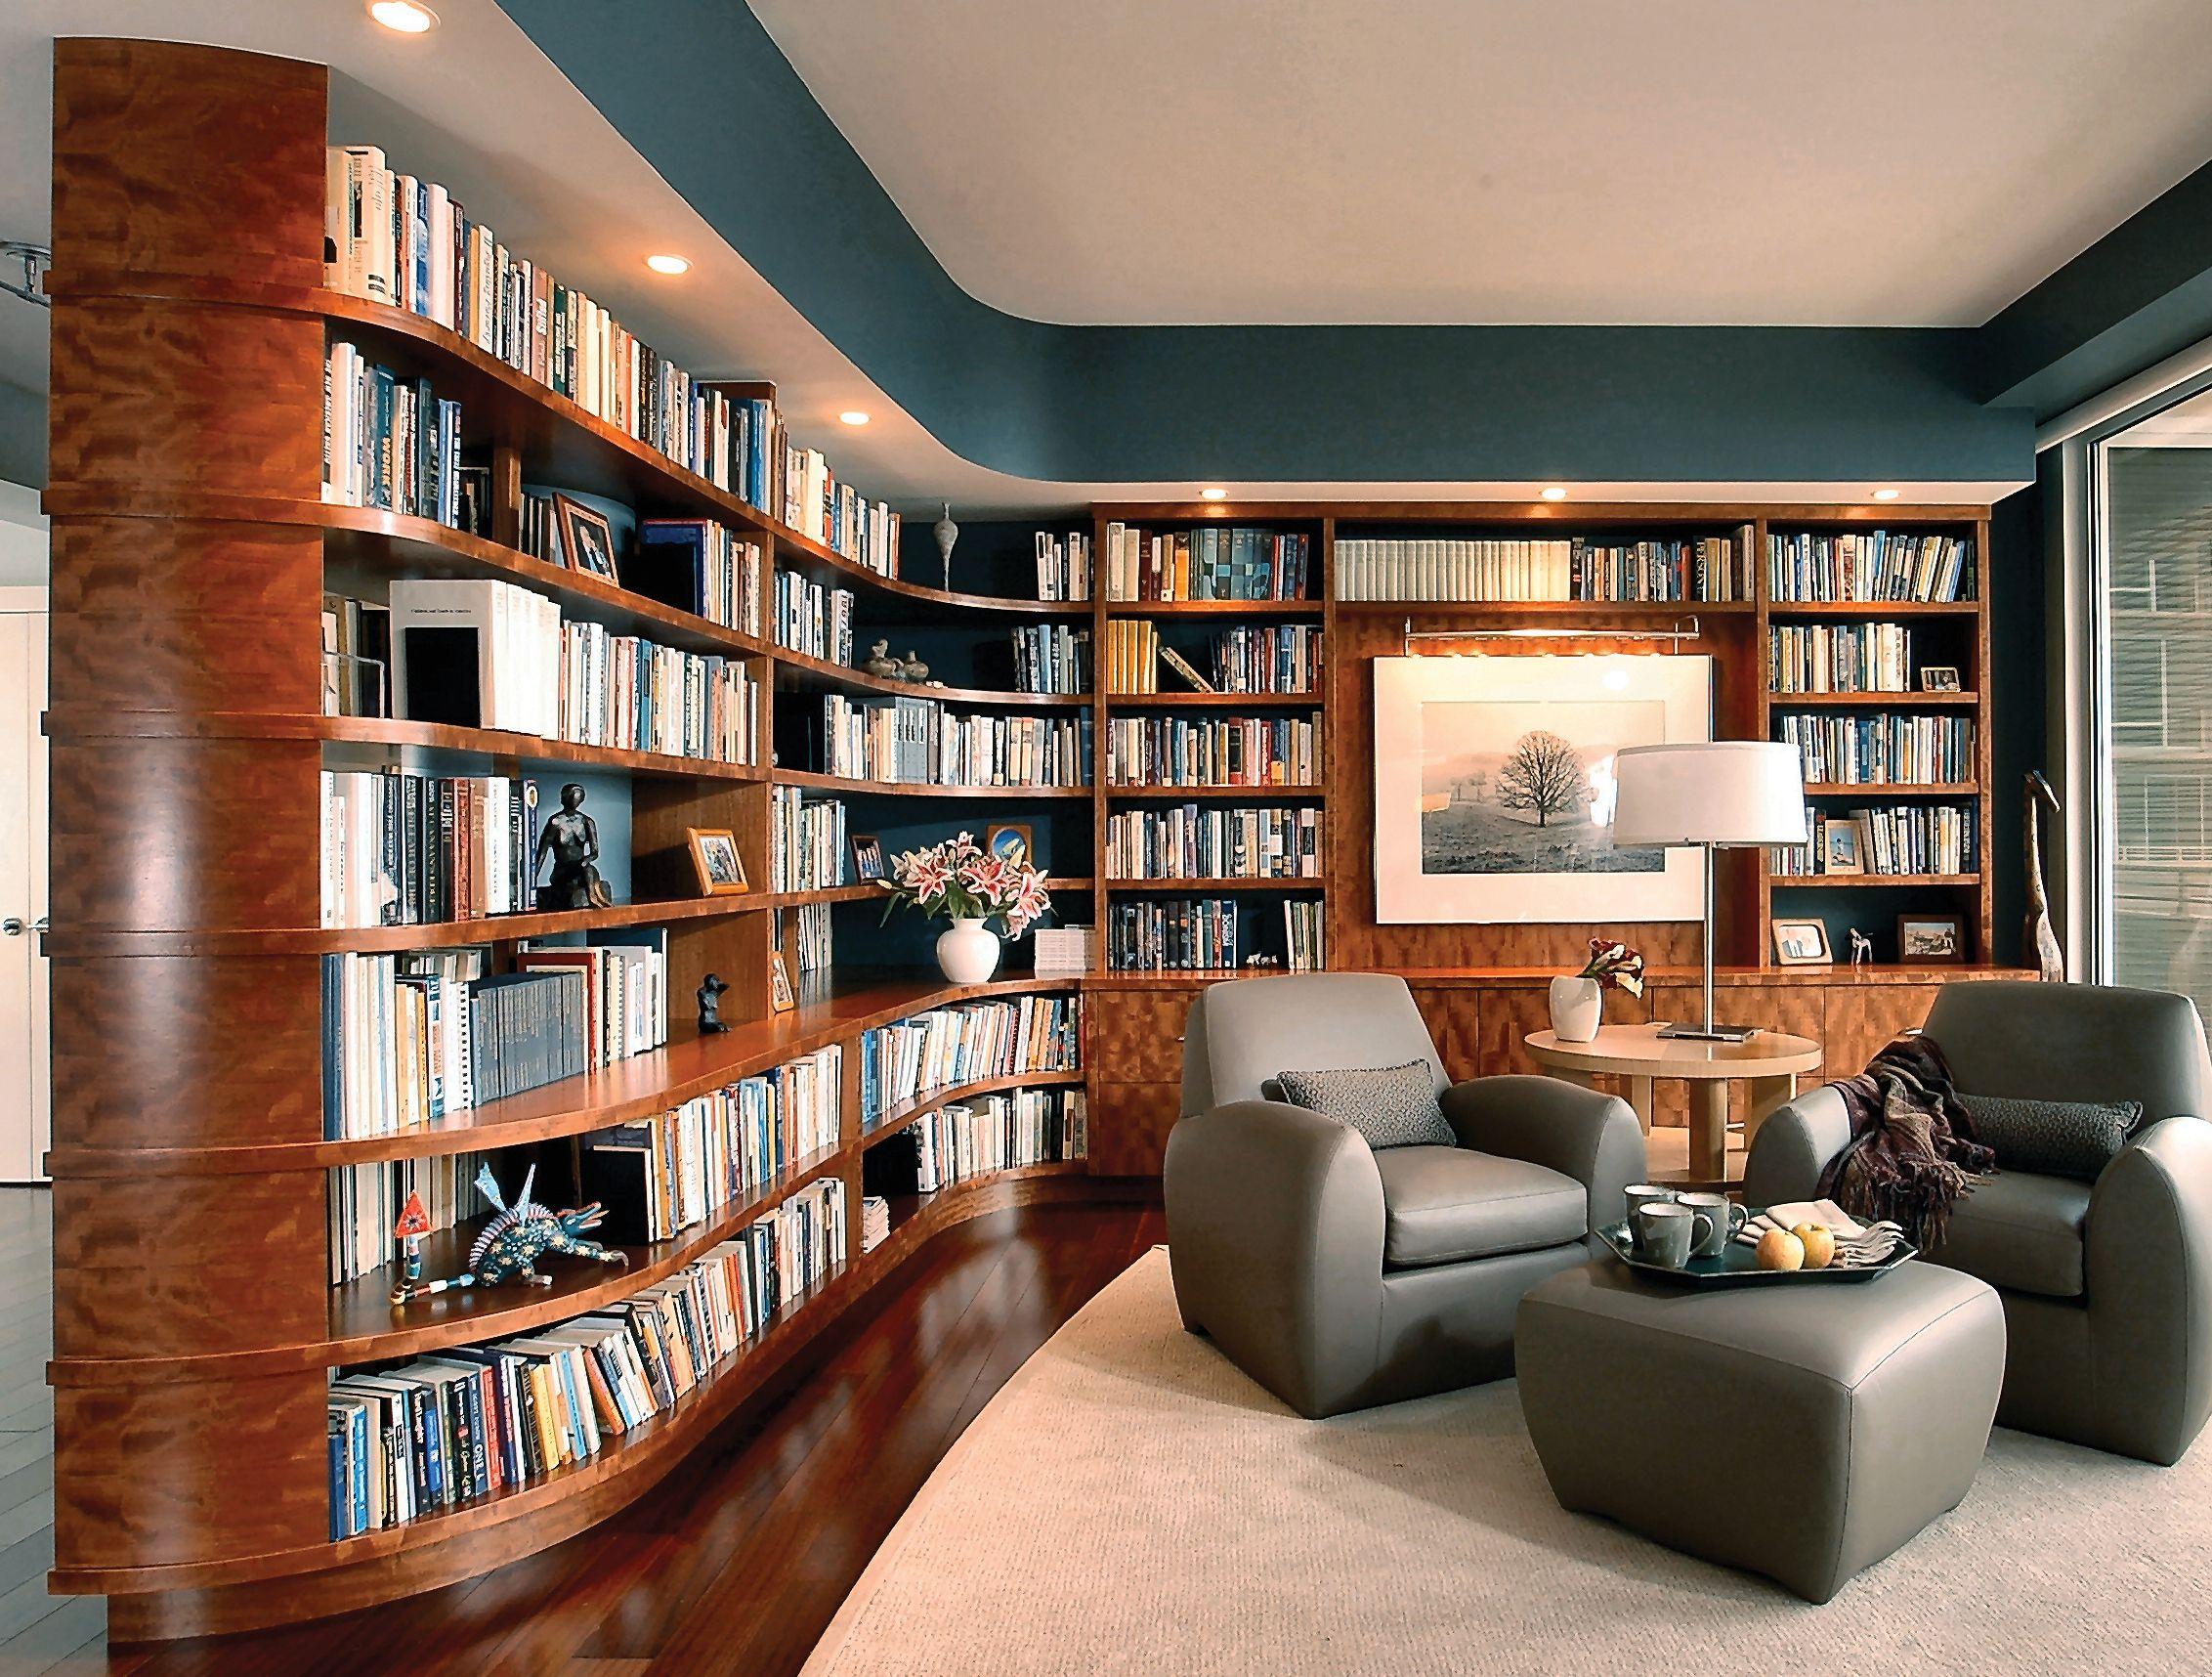 Bookshelves Library Home Library Decor Home Library Design Cozy Home Library